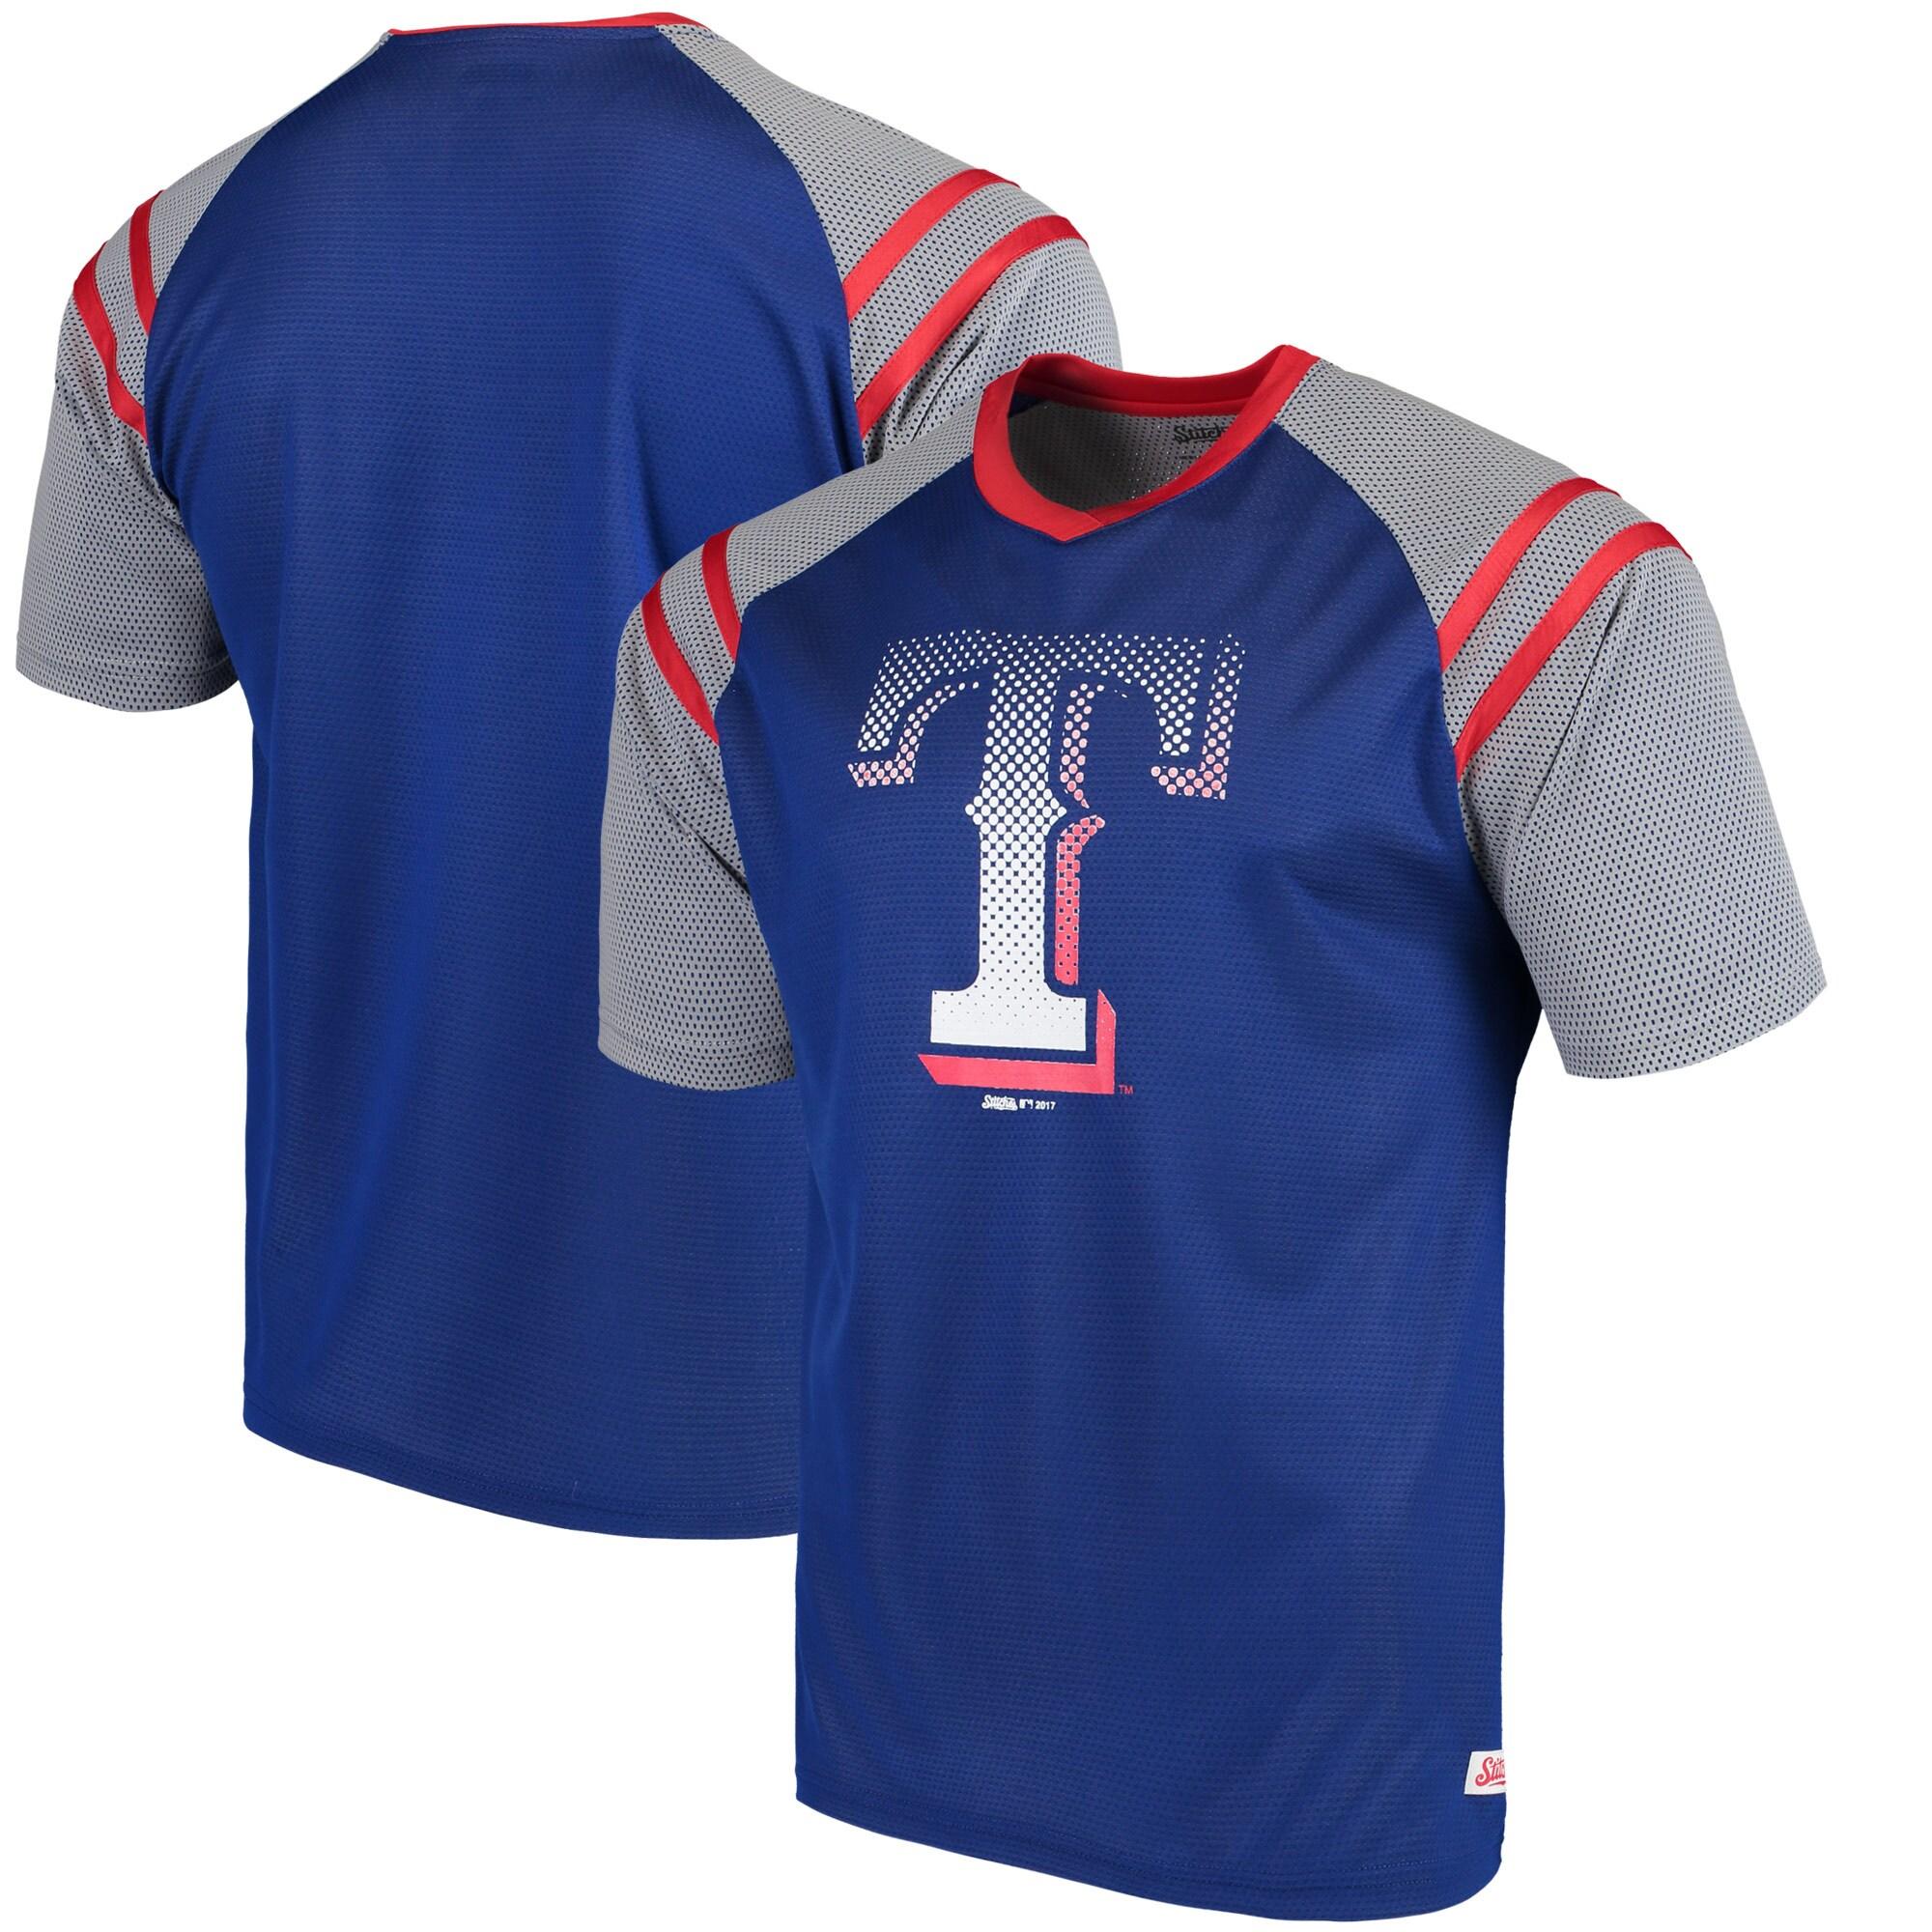 Texas Rangers Stitches V-Neck Mesh Jersey T-Shirt - Royal/Red